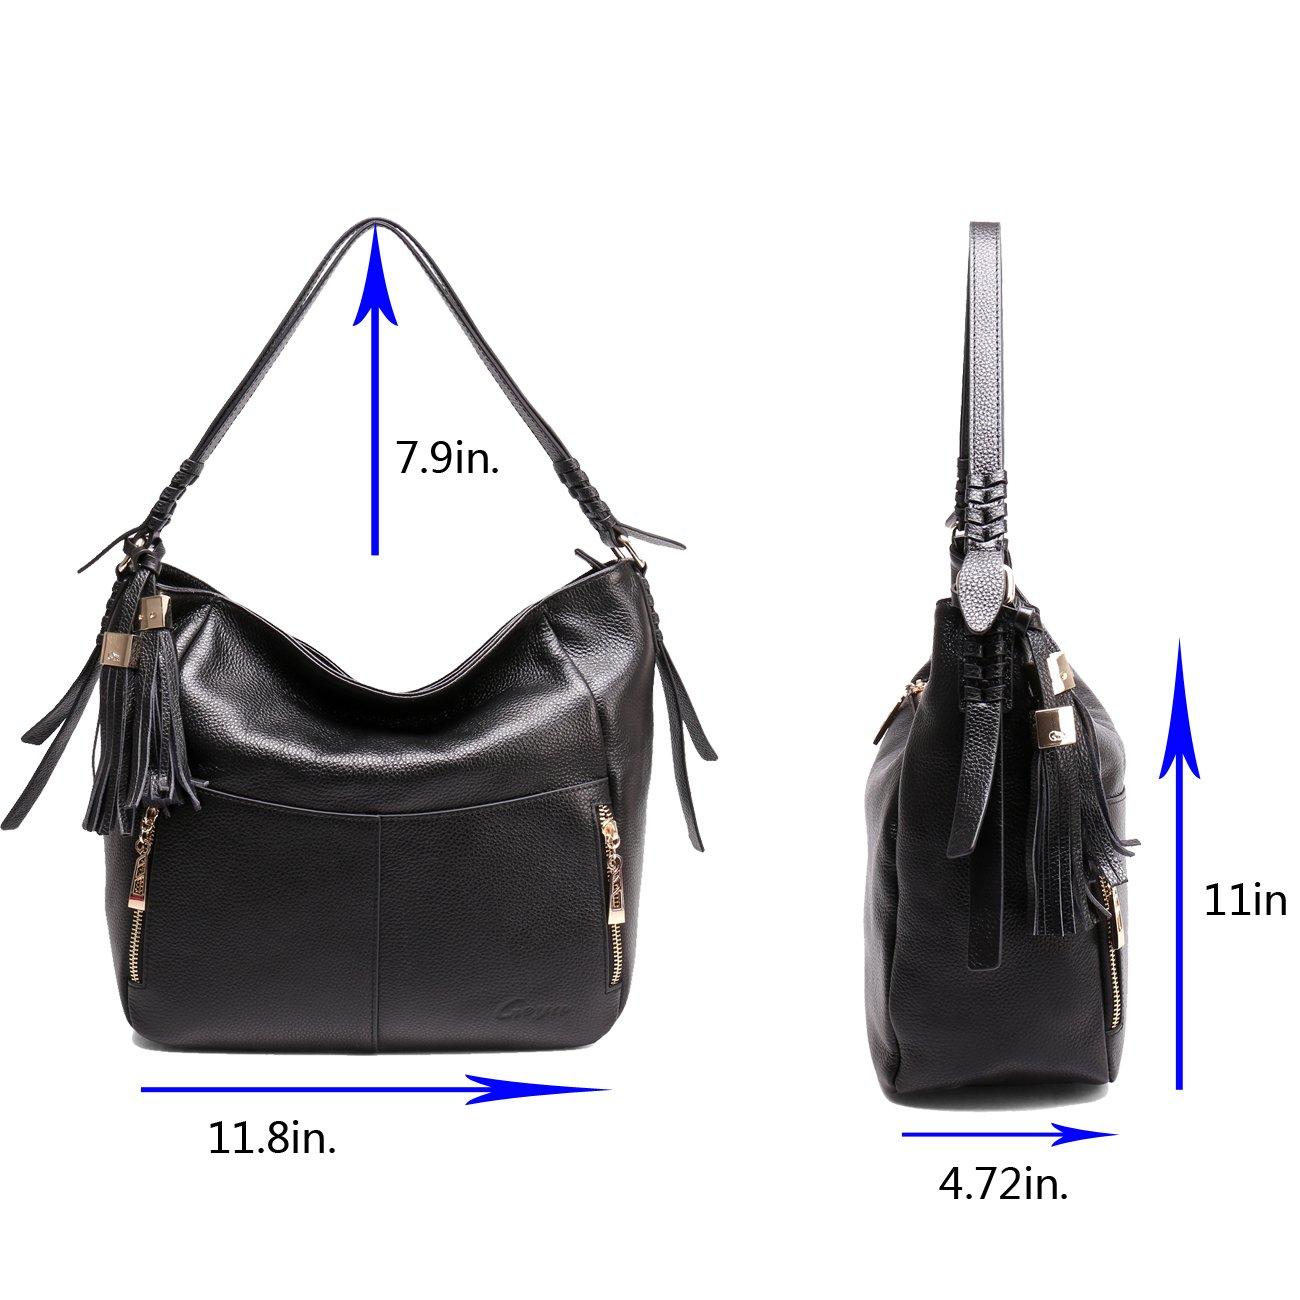 Geya Women's Fashion Genuine Leather Handbag Shoulder Handbag with Imported Soft Hot Leather (Black) by Geya (Image #3)